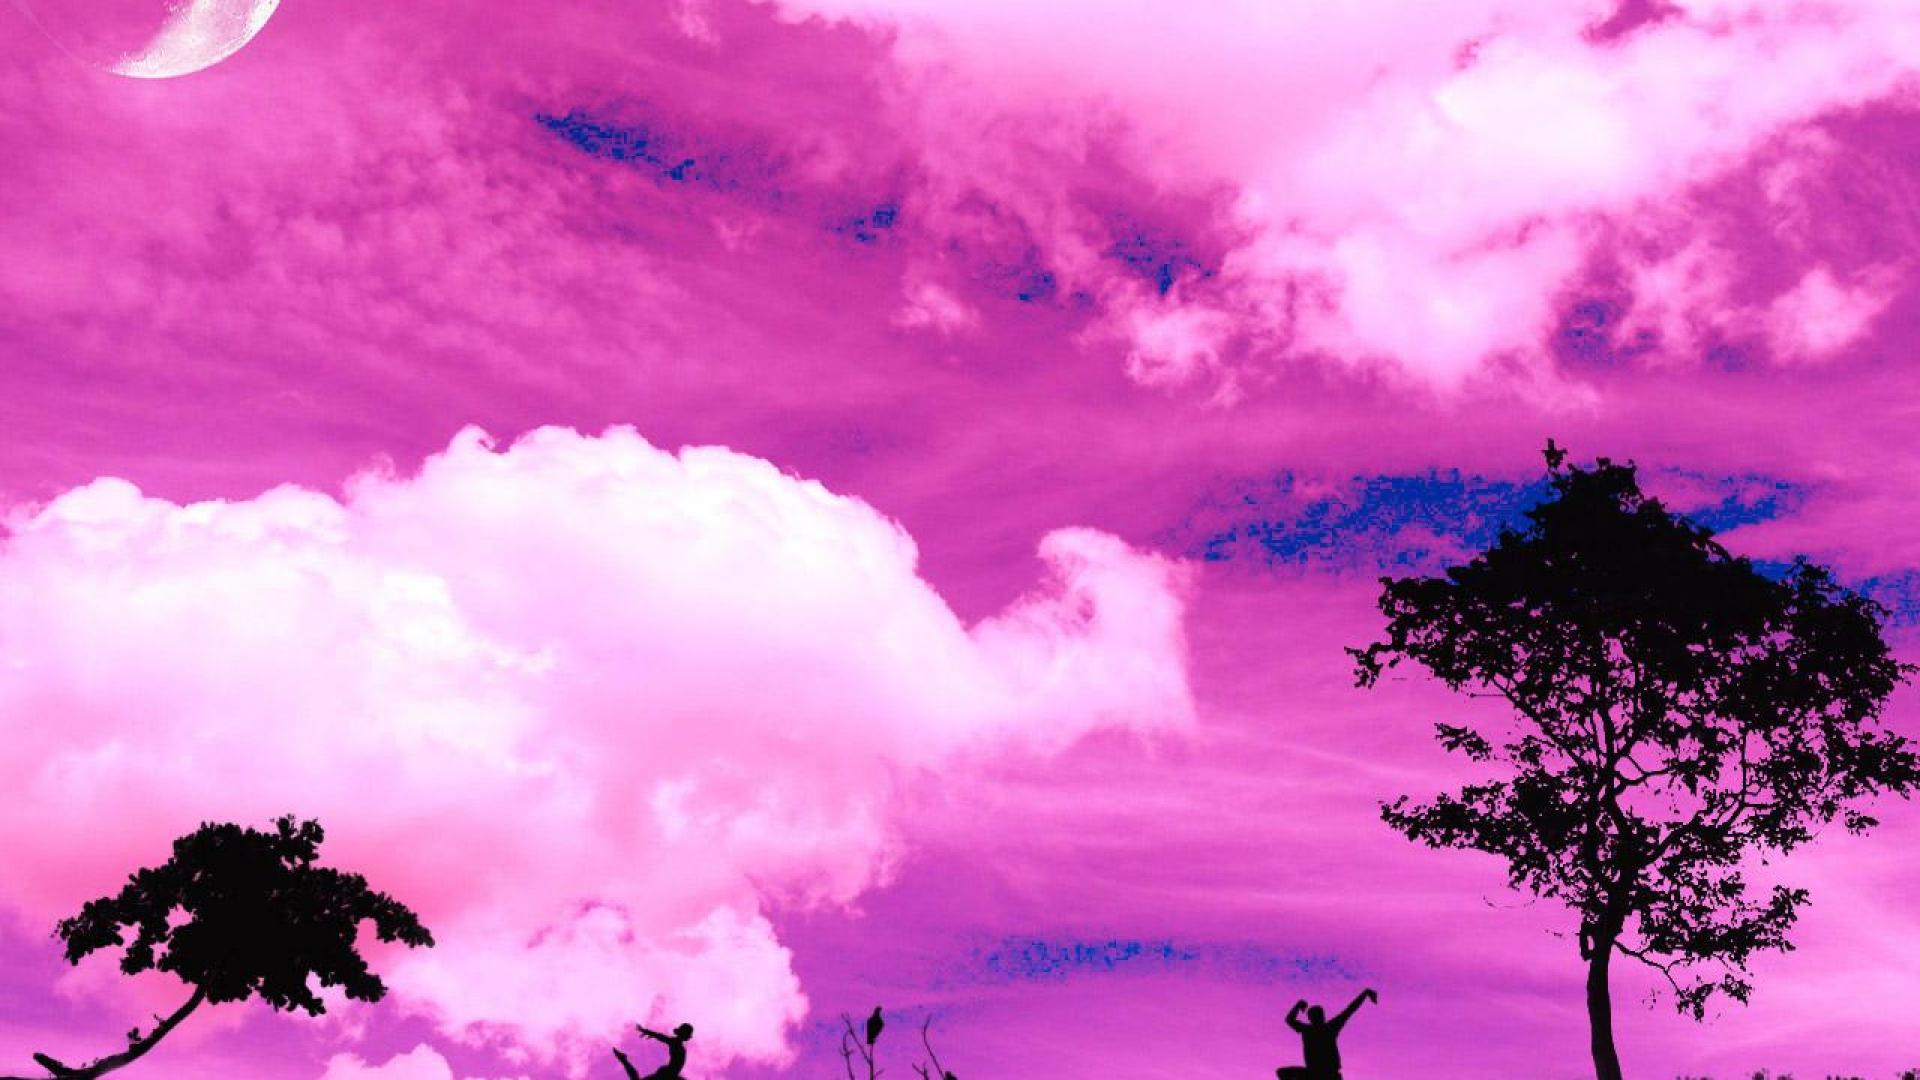 Pink Color Desktop Backgrounds   Wallpaper High Definition High 1920x1080